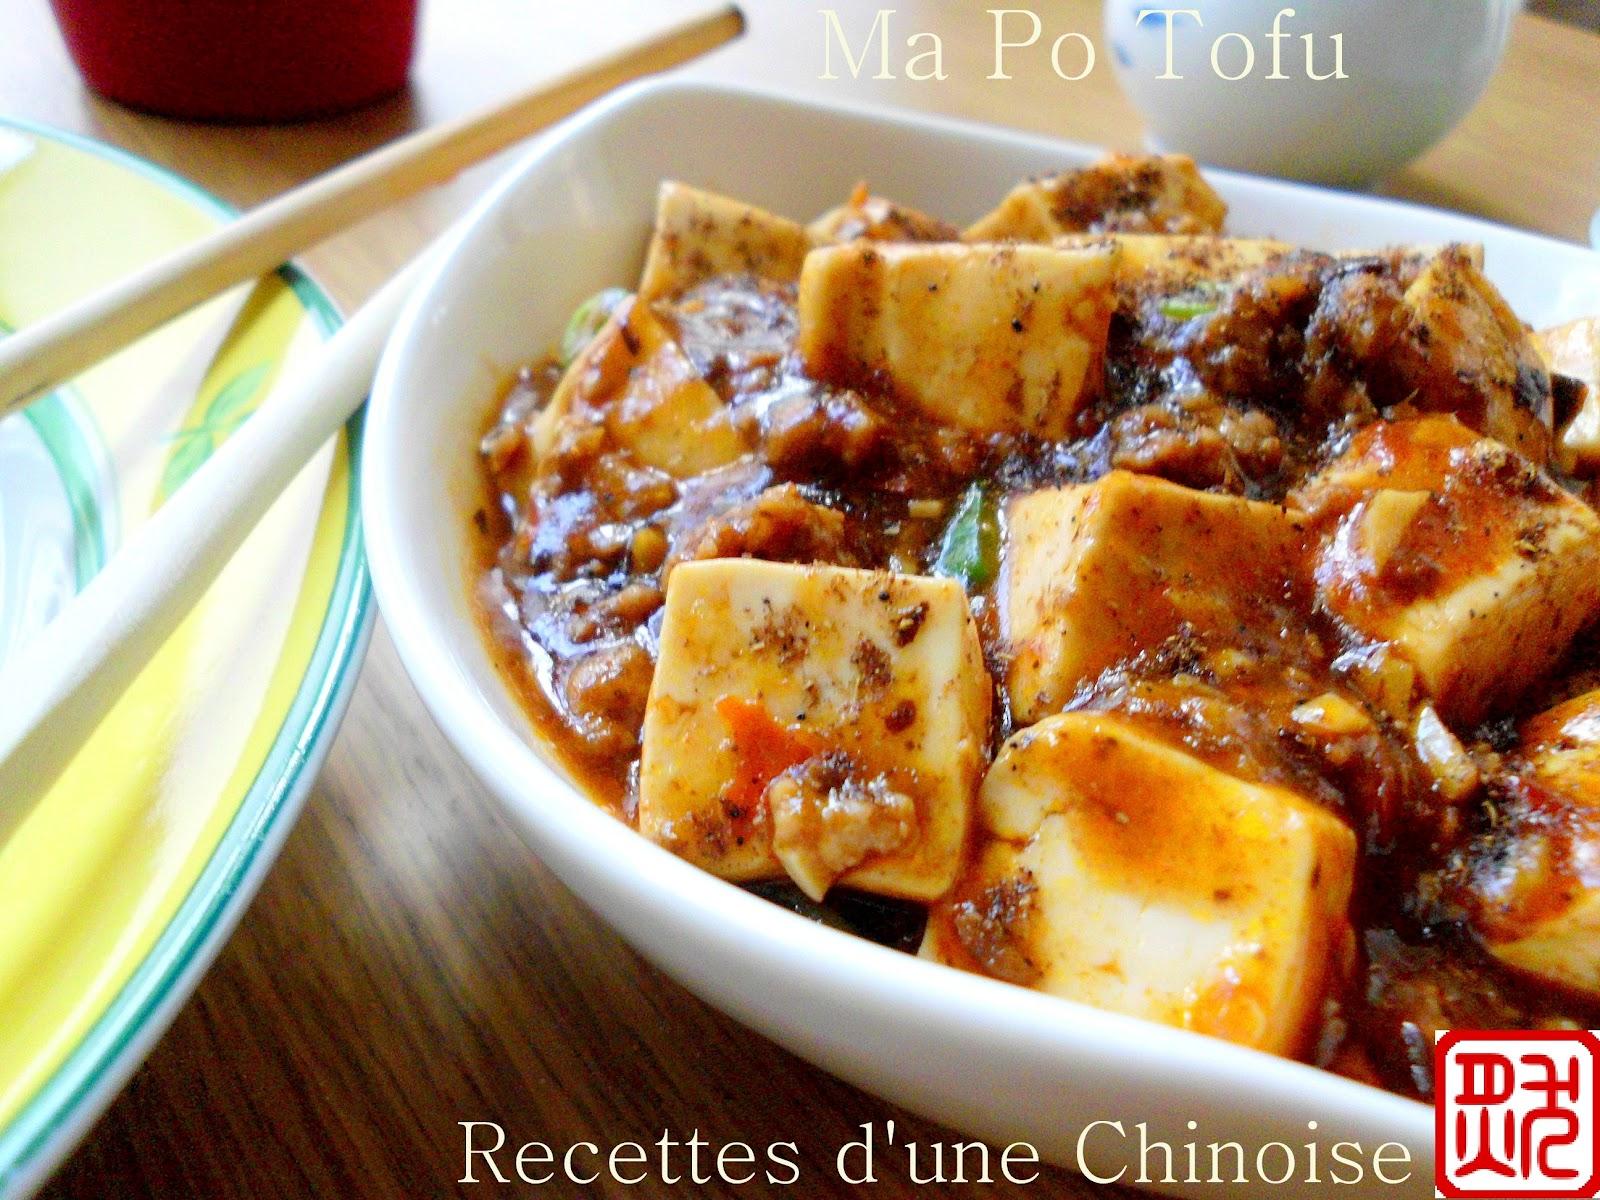 Recettes d'une Chinoise: Ma Po Tofu (ou Tofou) 麻婆豆腐 mápó on